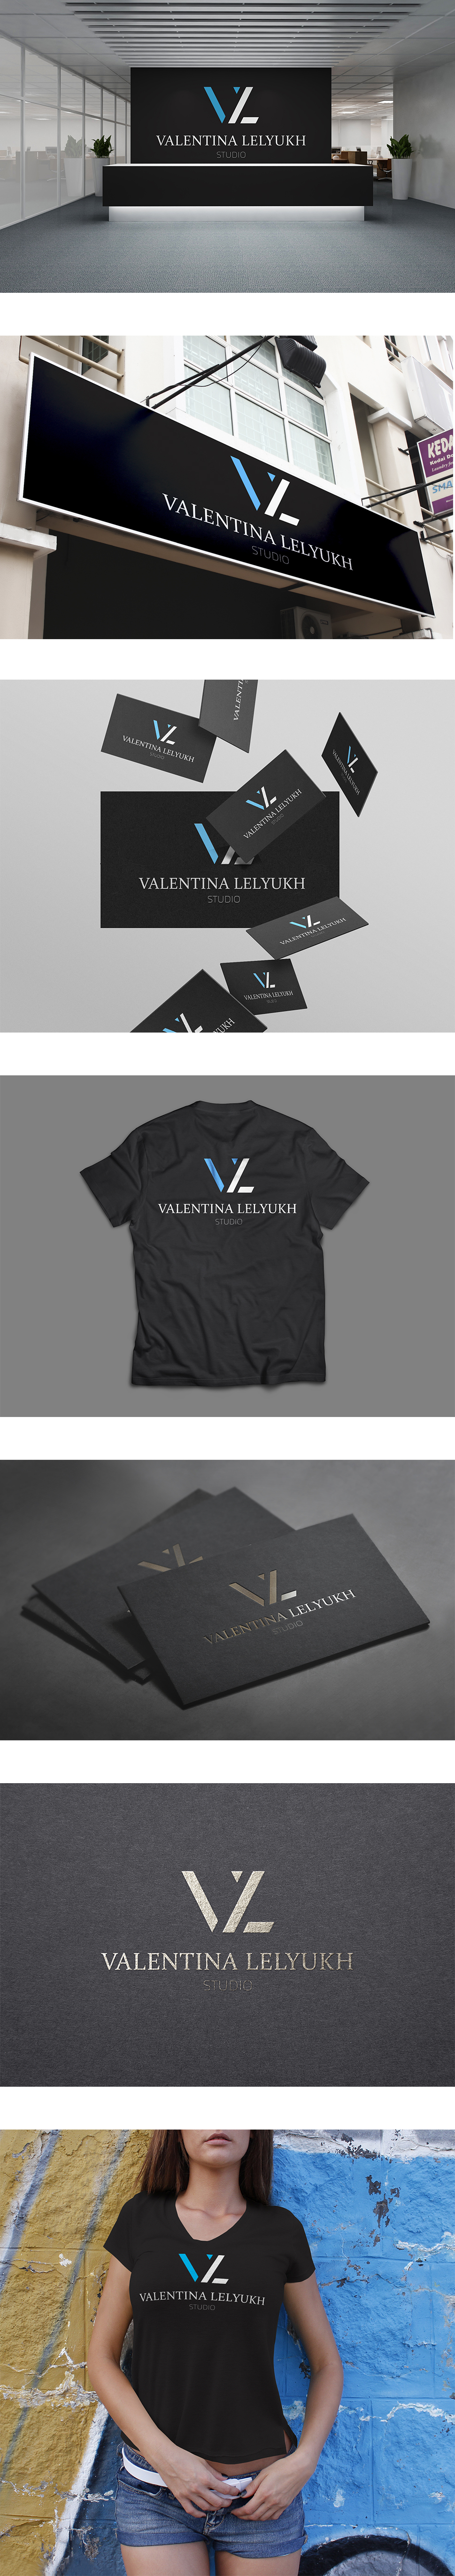 Разработка логотипа – Valentina Lelyukh Studio